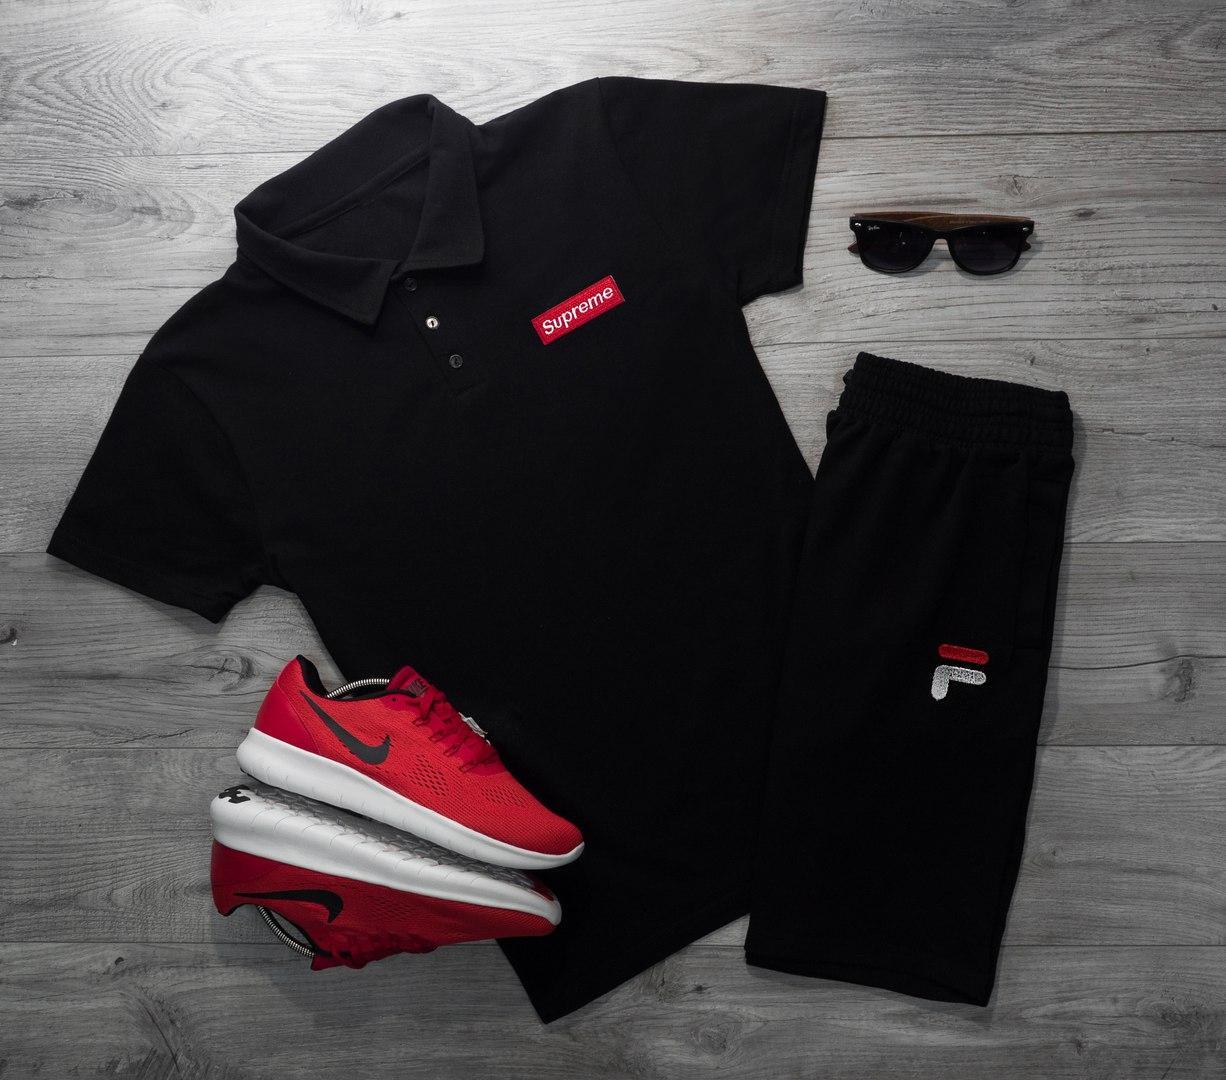 Мужская футболка (поло) в стиле Supreme черная (L, XL размеры)